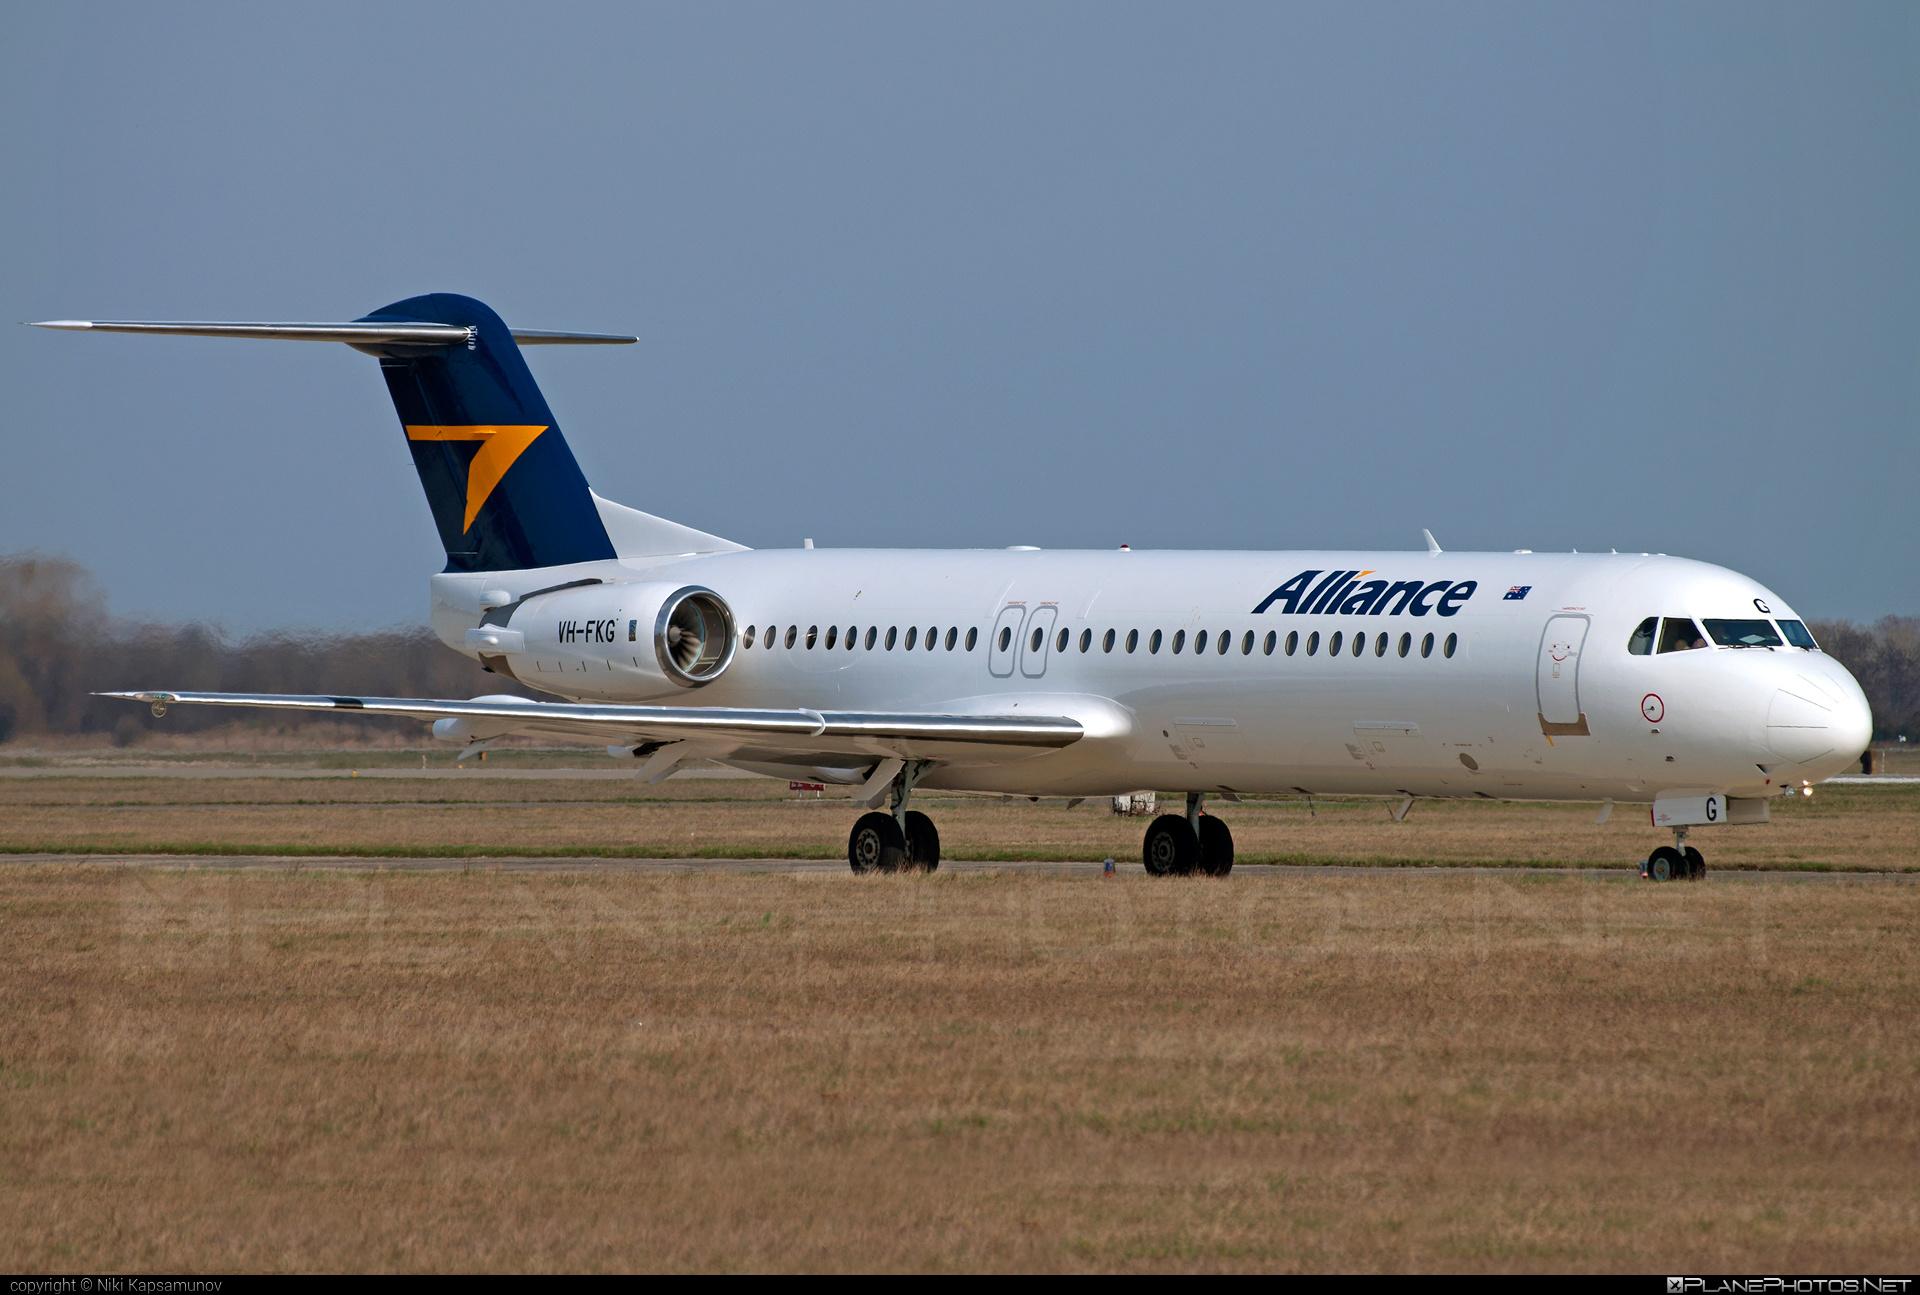 Fokker 100 - VH-FKG operated by Alliance Airlines #fokker